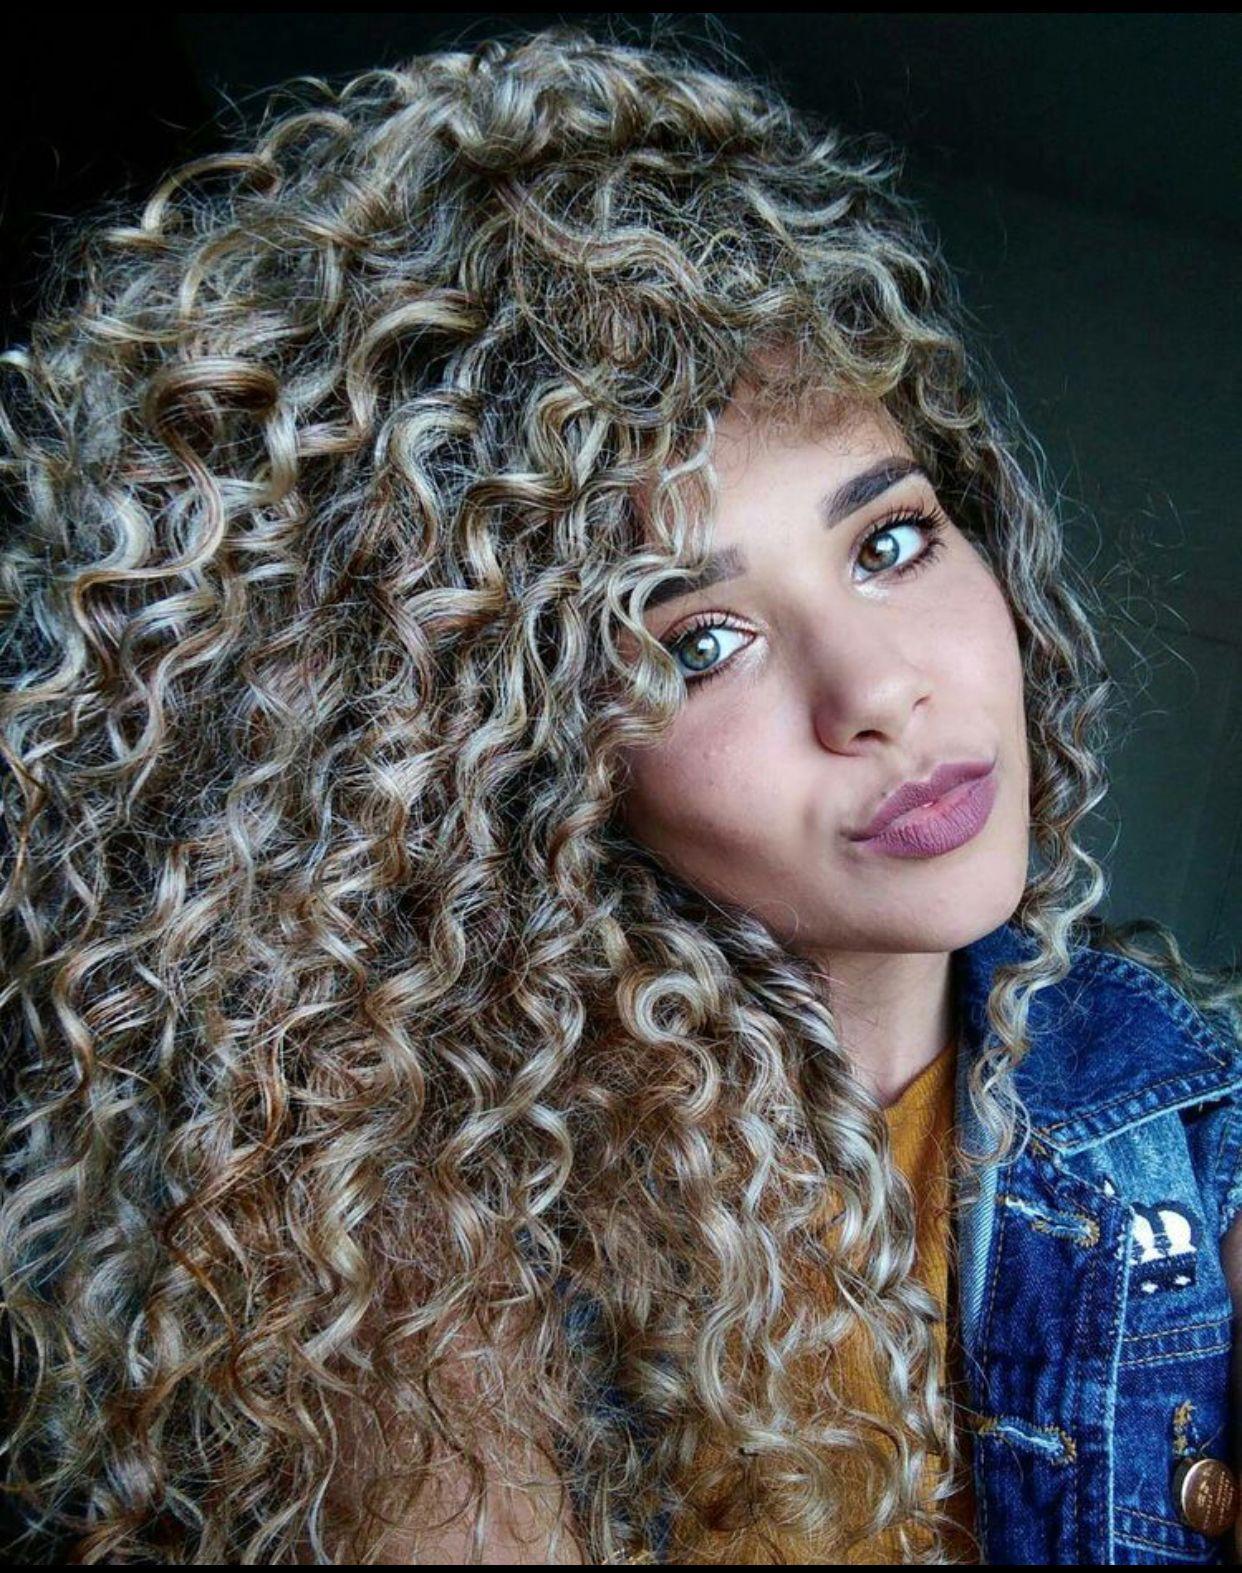 Pin by ashlyn pokorny on hair in pinterest hair curly